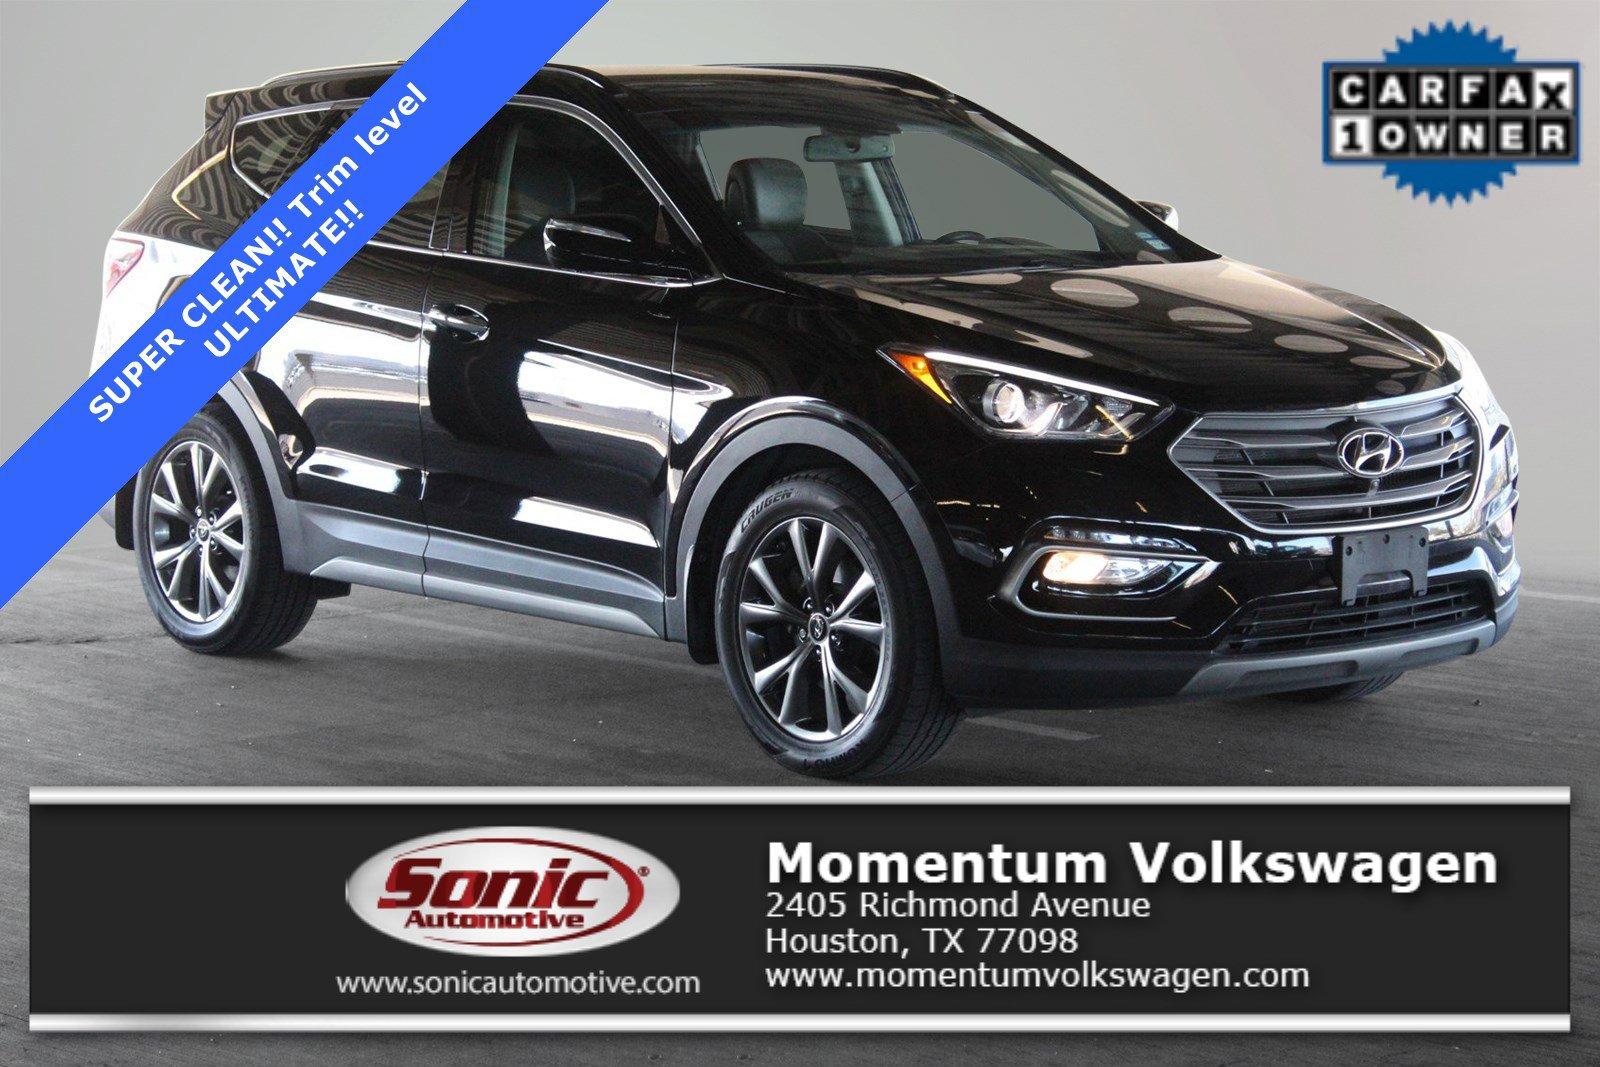 2018 Hyundai Santa Fe AWD Sport 2.0T image